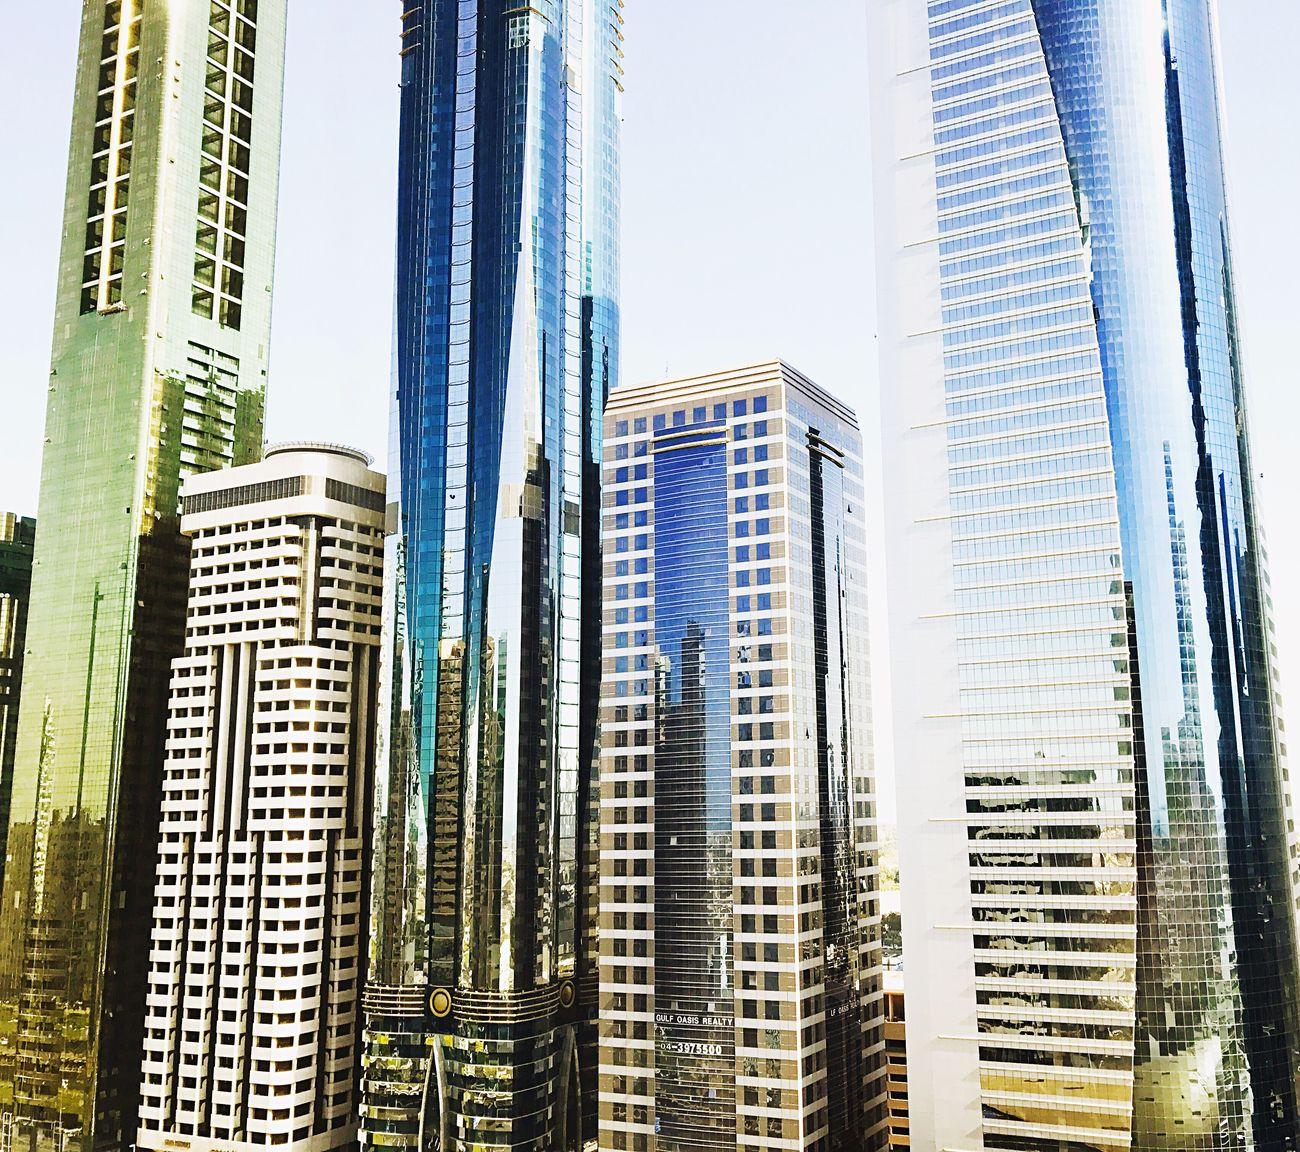 Skyscraper City Architecture Dubai DXB First Eyeem Photo